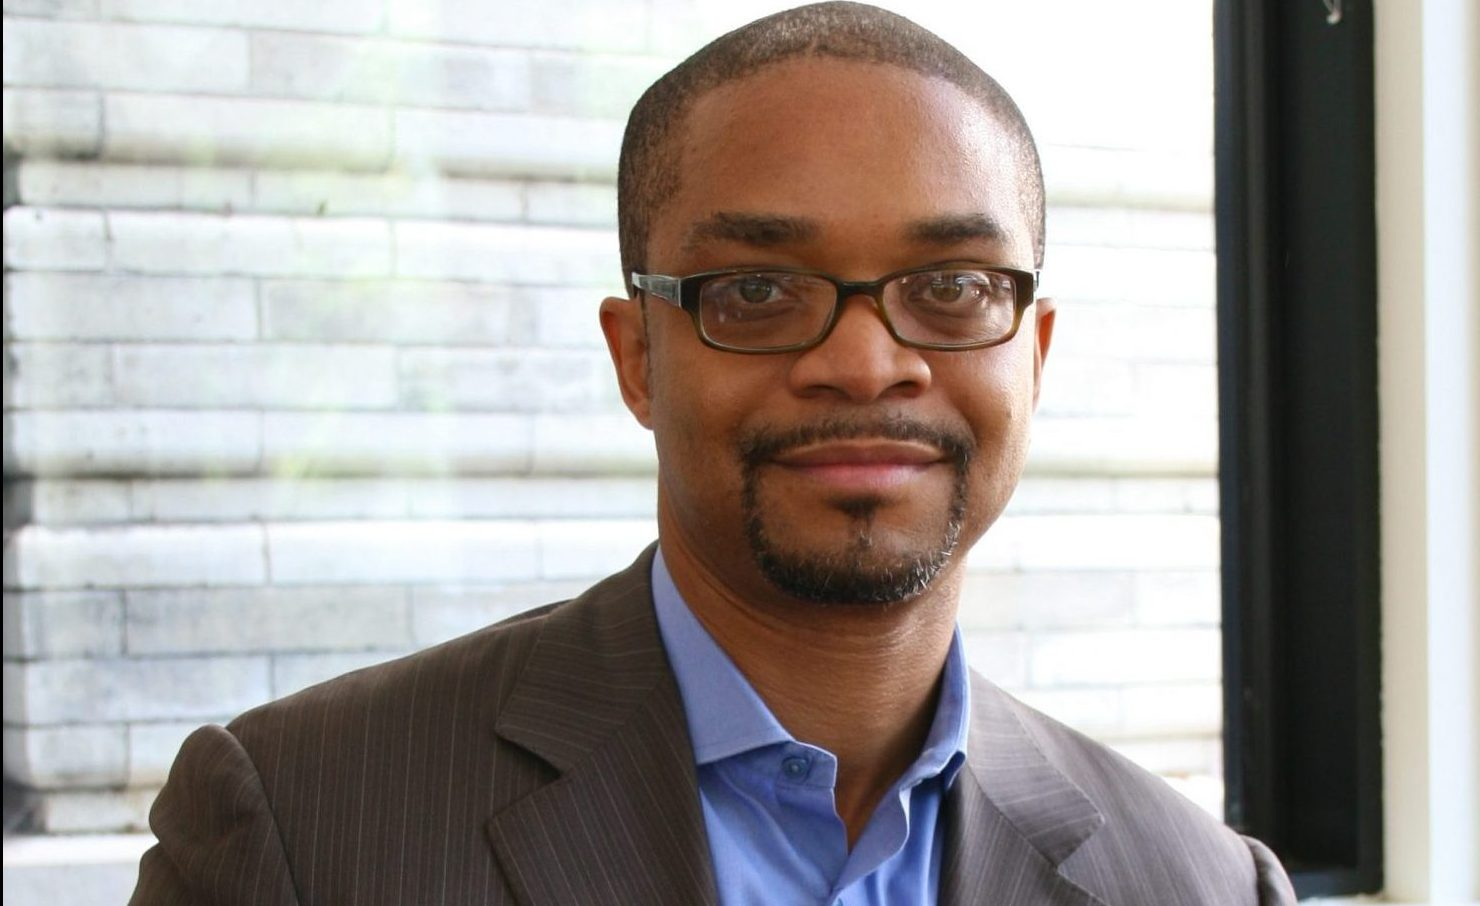 Darryl Harper, Settlement alumnus